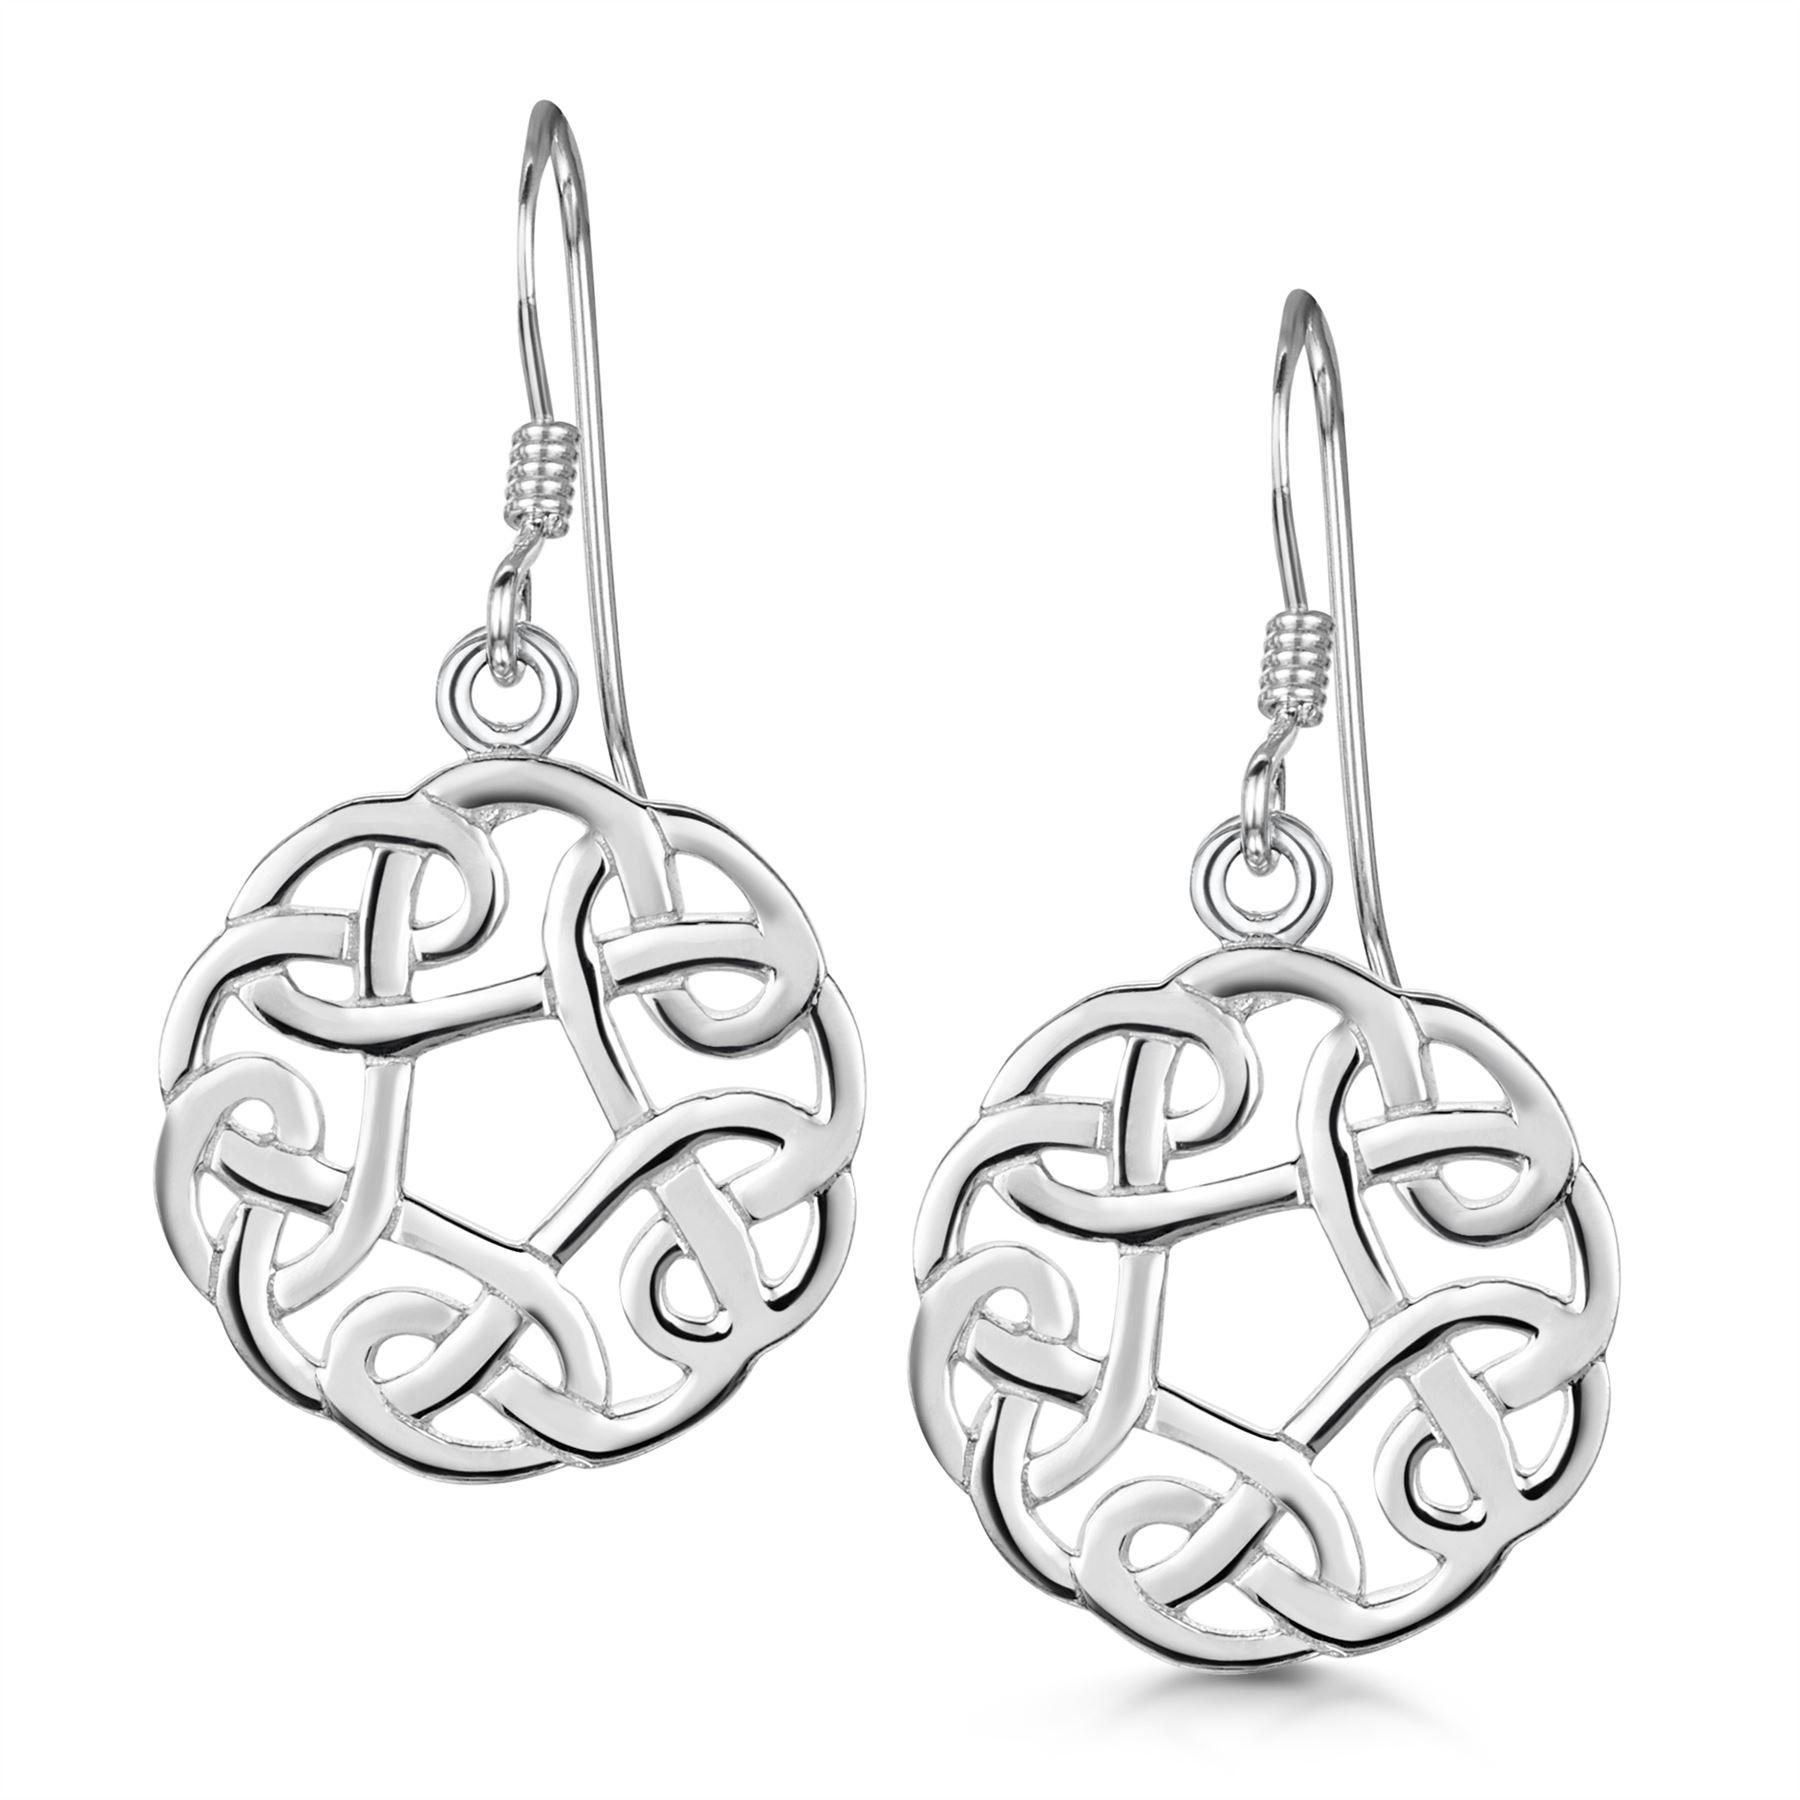 Amberta-925-Sterling-Silver-Celtic-Knot-Earrings-for-Women-Irish-Design miniature 20